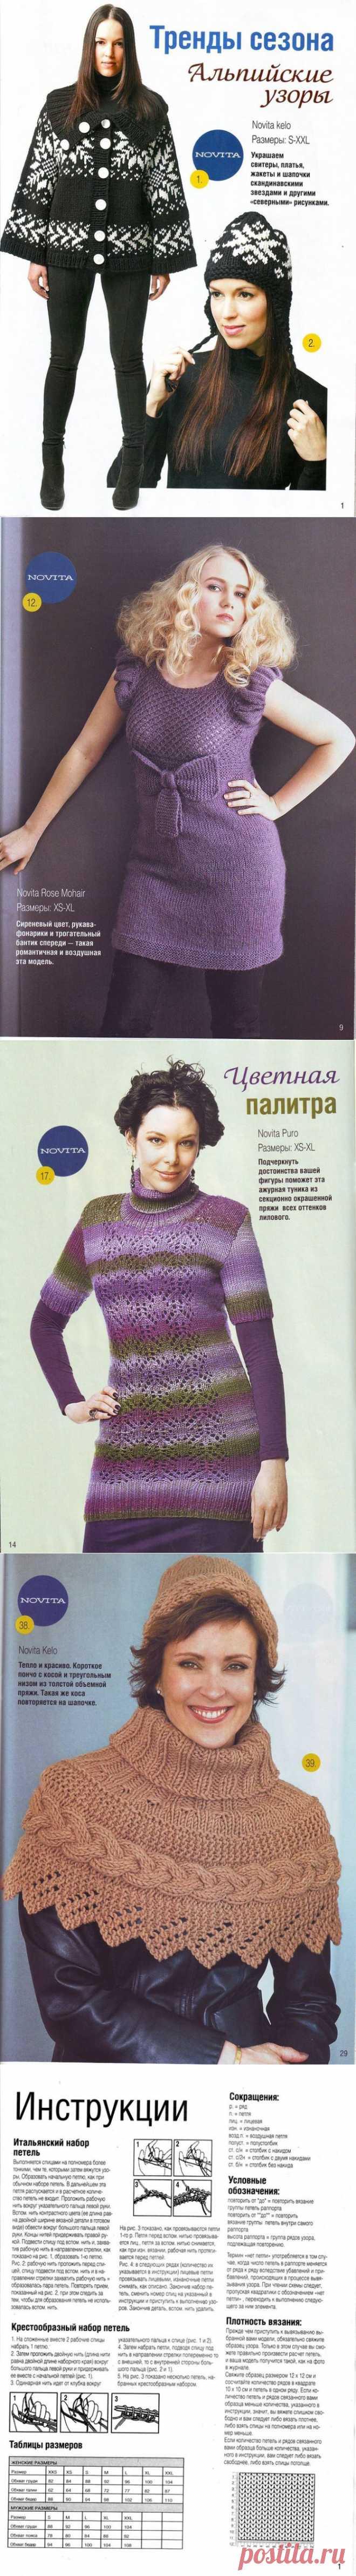 Вязаная мода из Финляндии 2/2011 - mad1959— я.ру